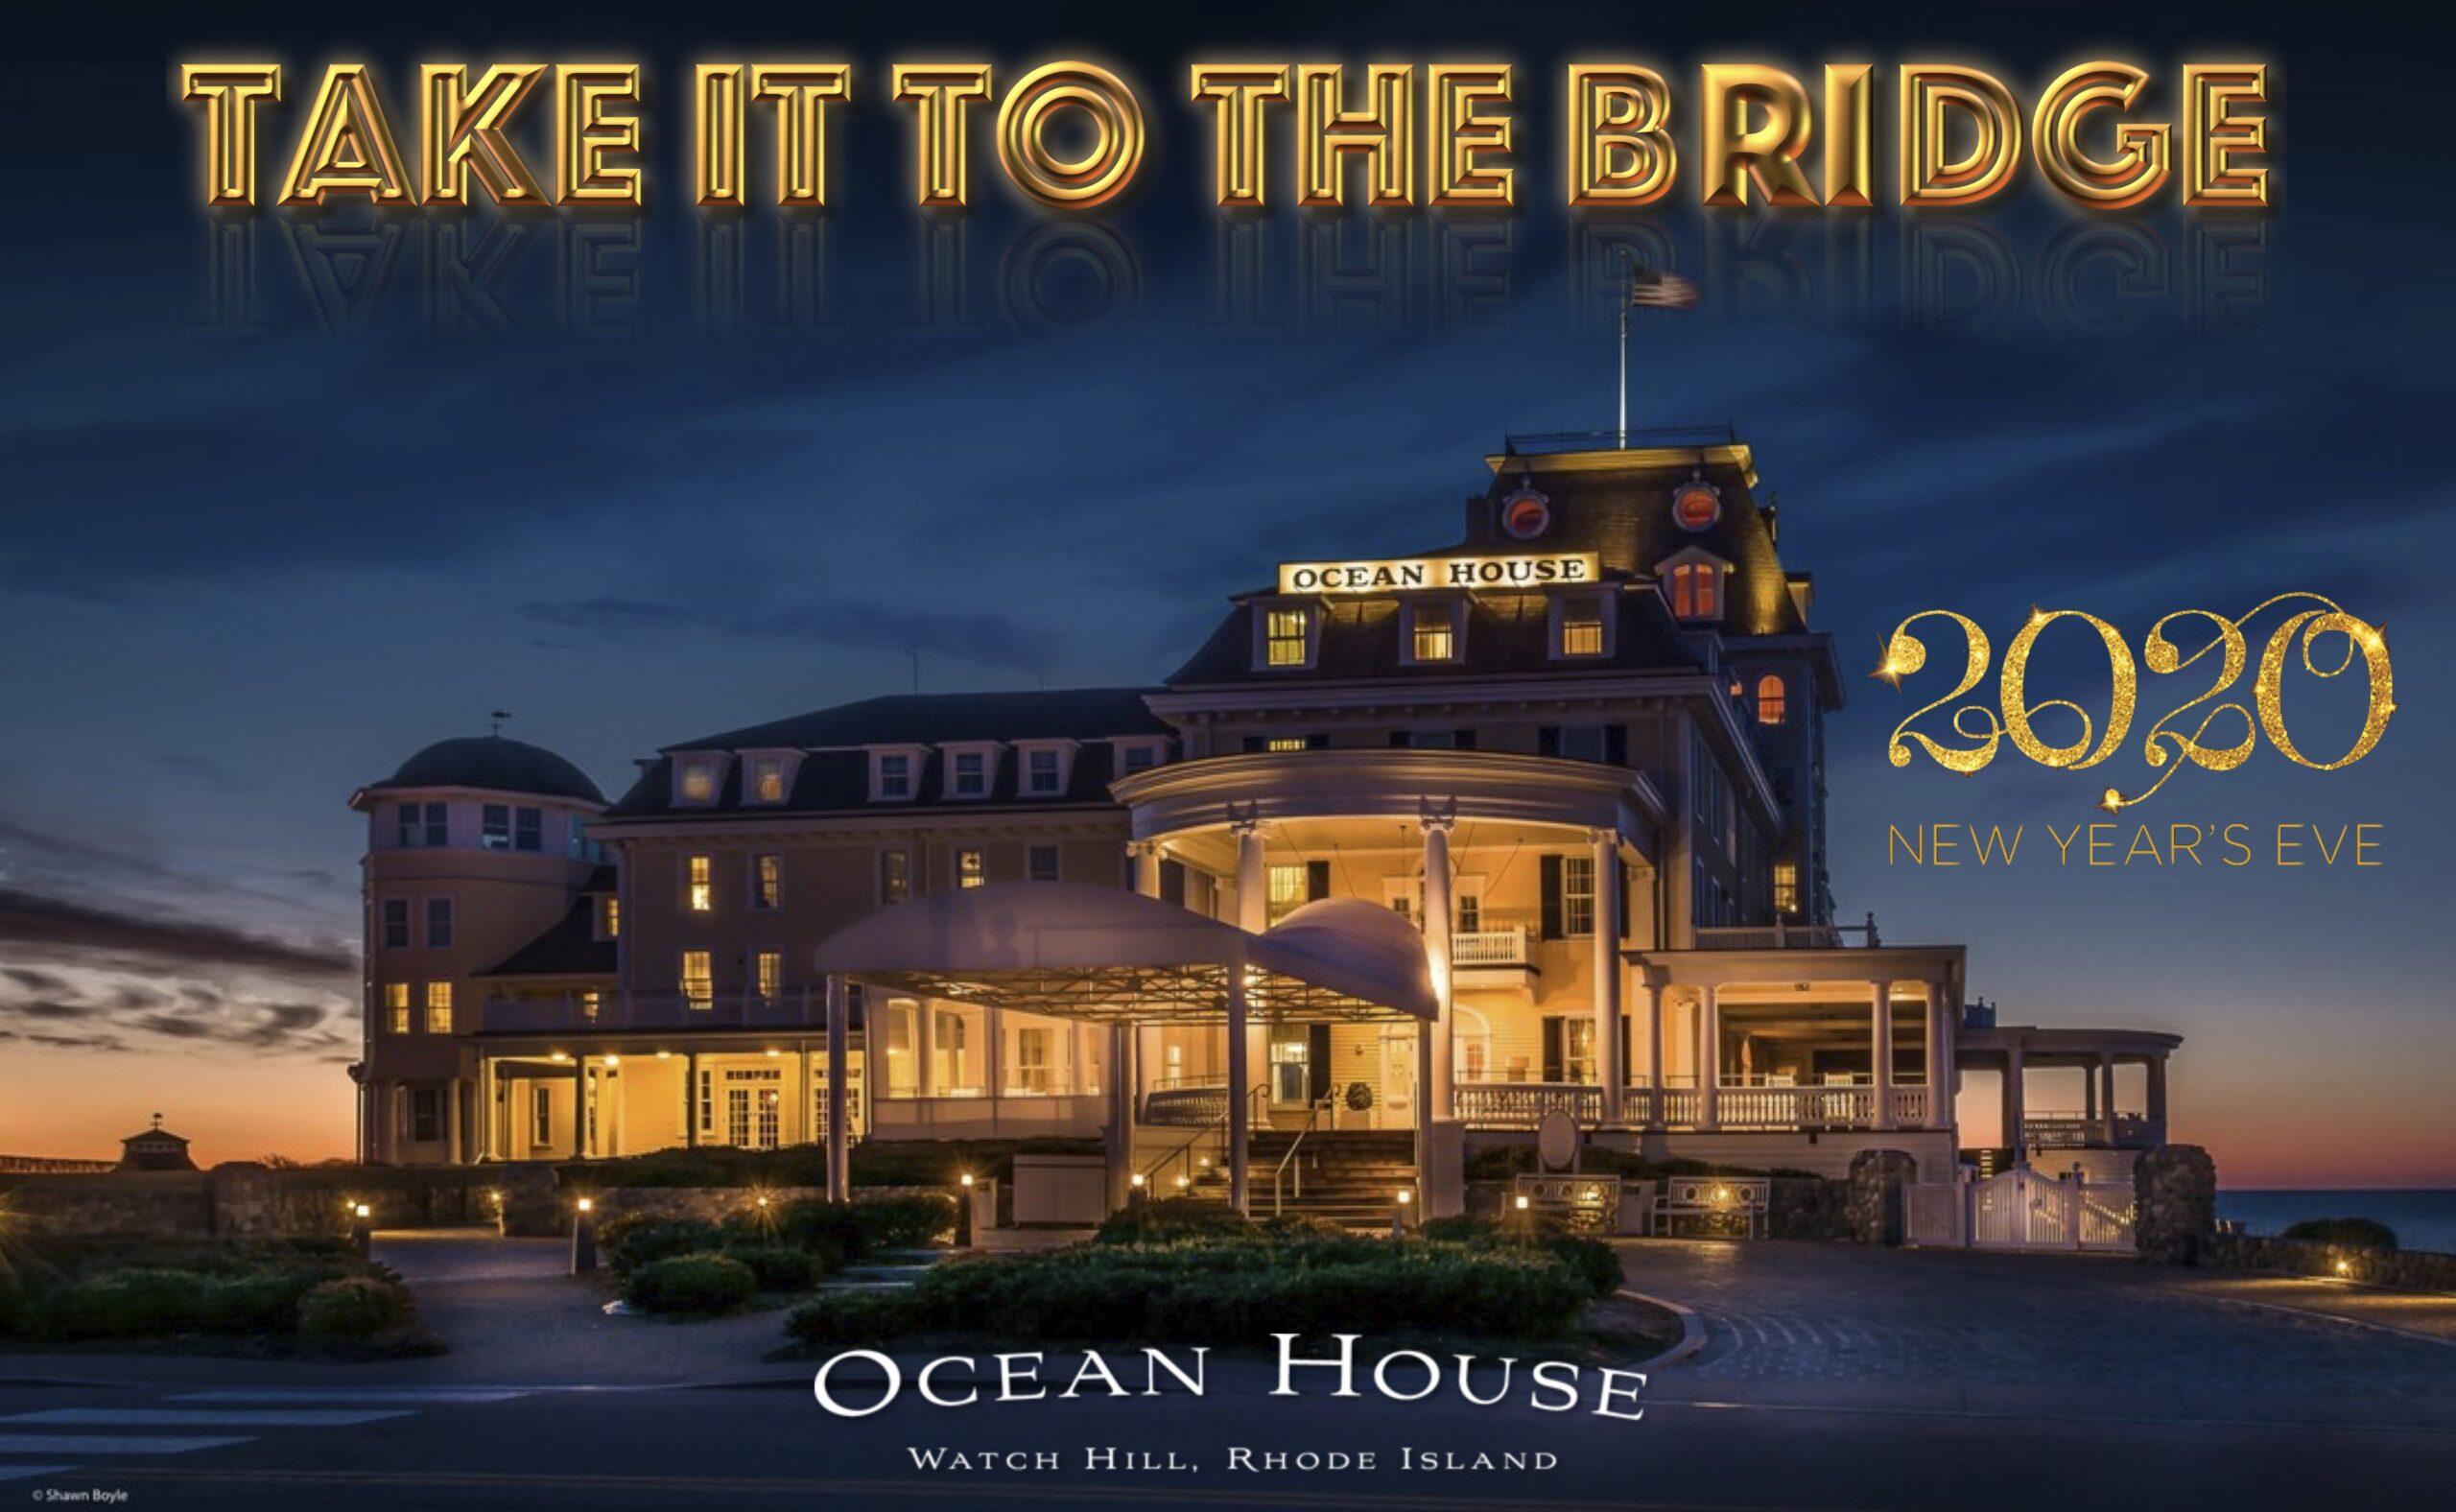 NYE 2020 Ocean House